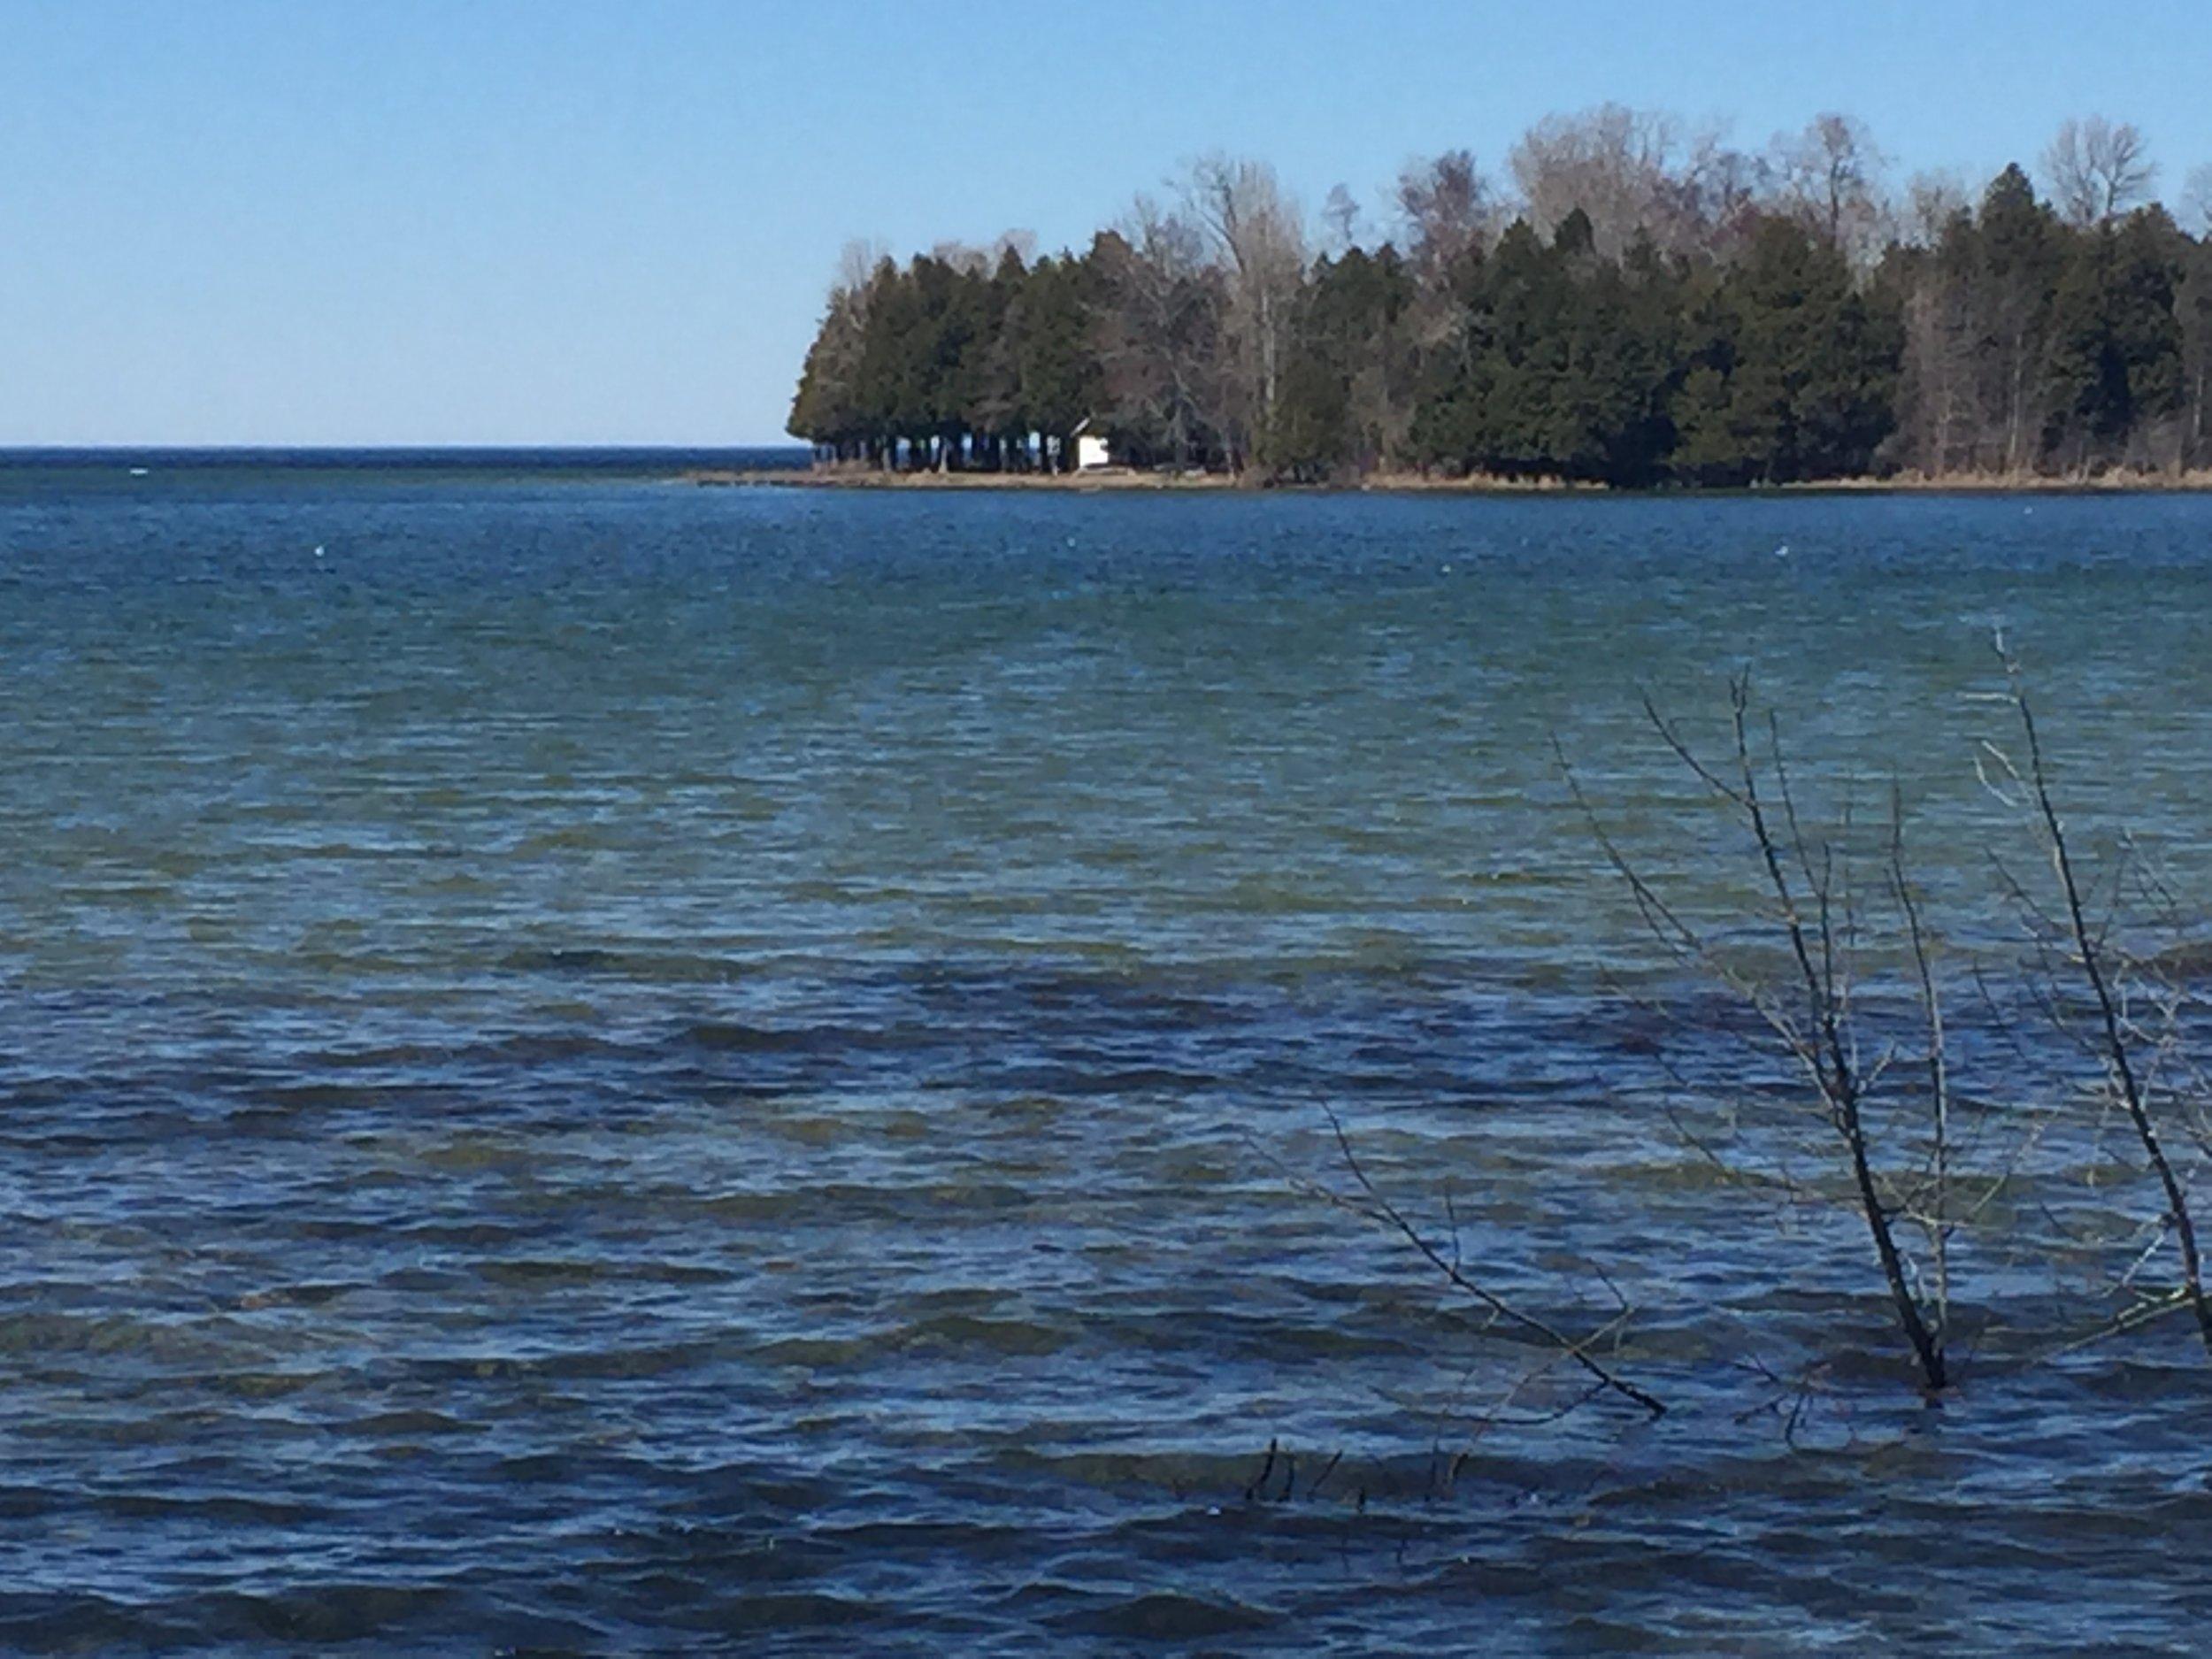 April 19 - All clear in Figenschau Bay.